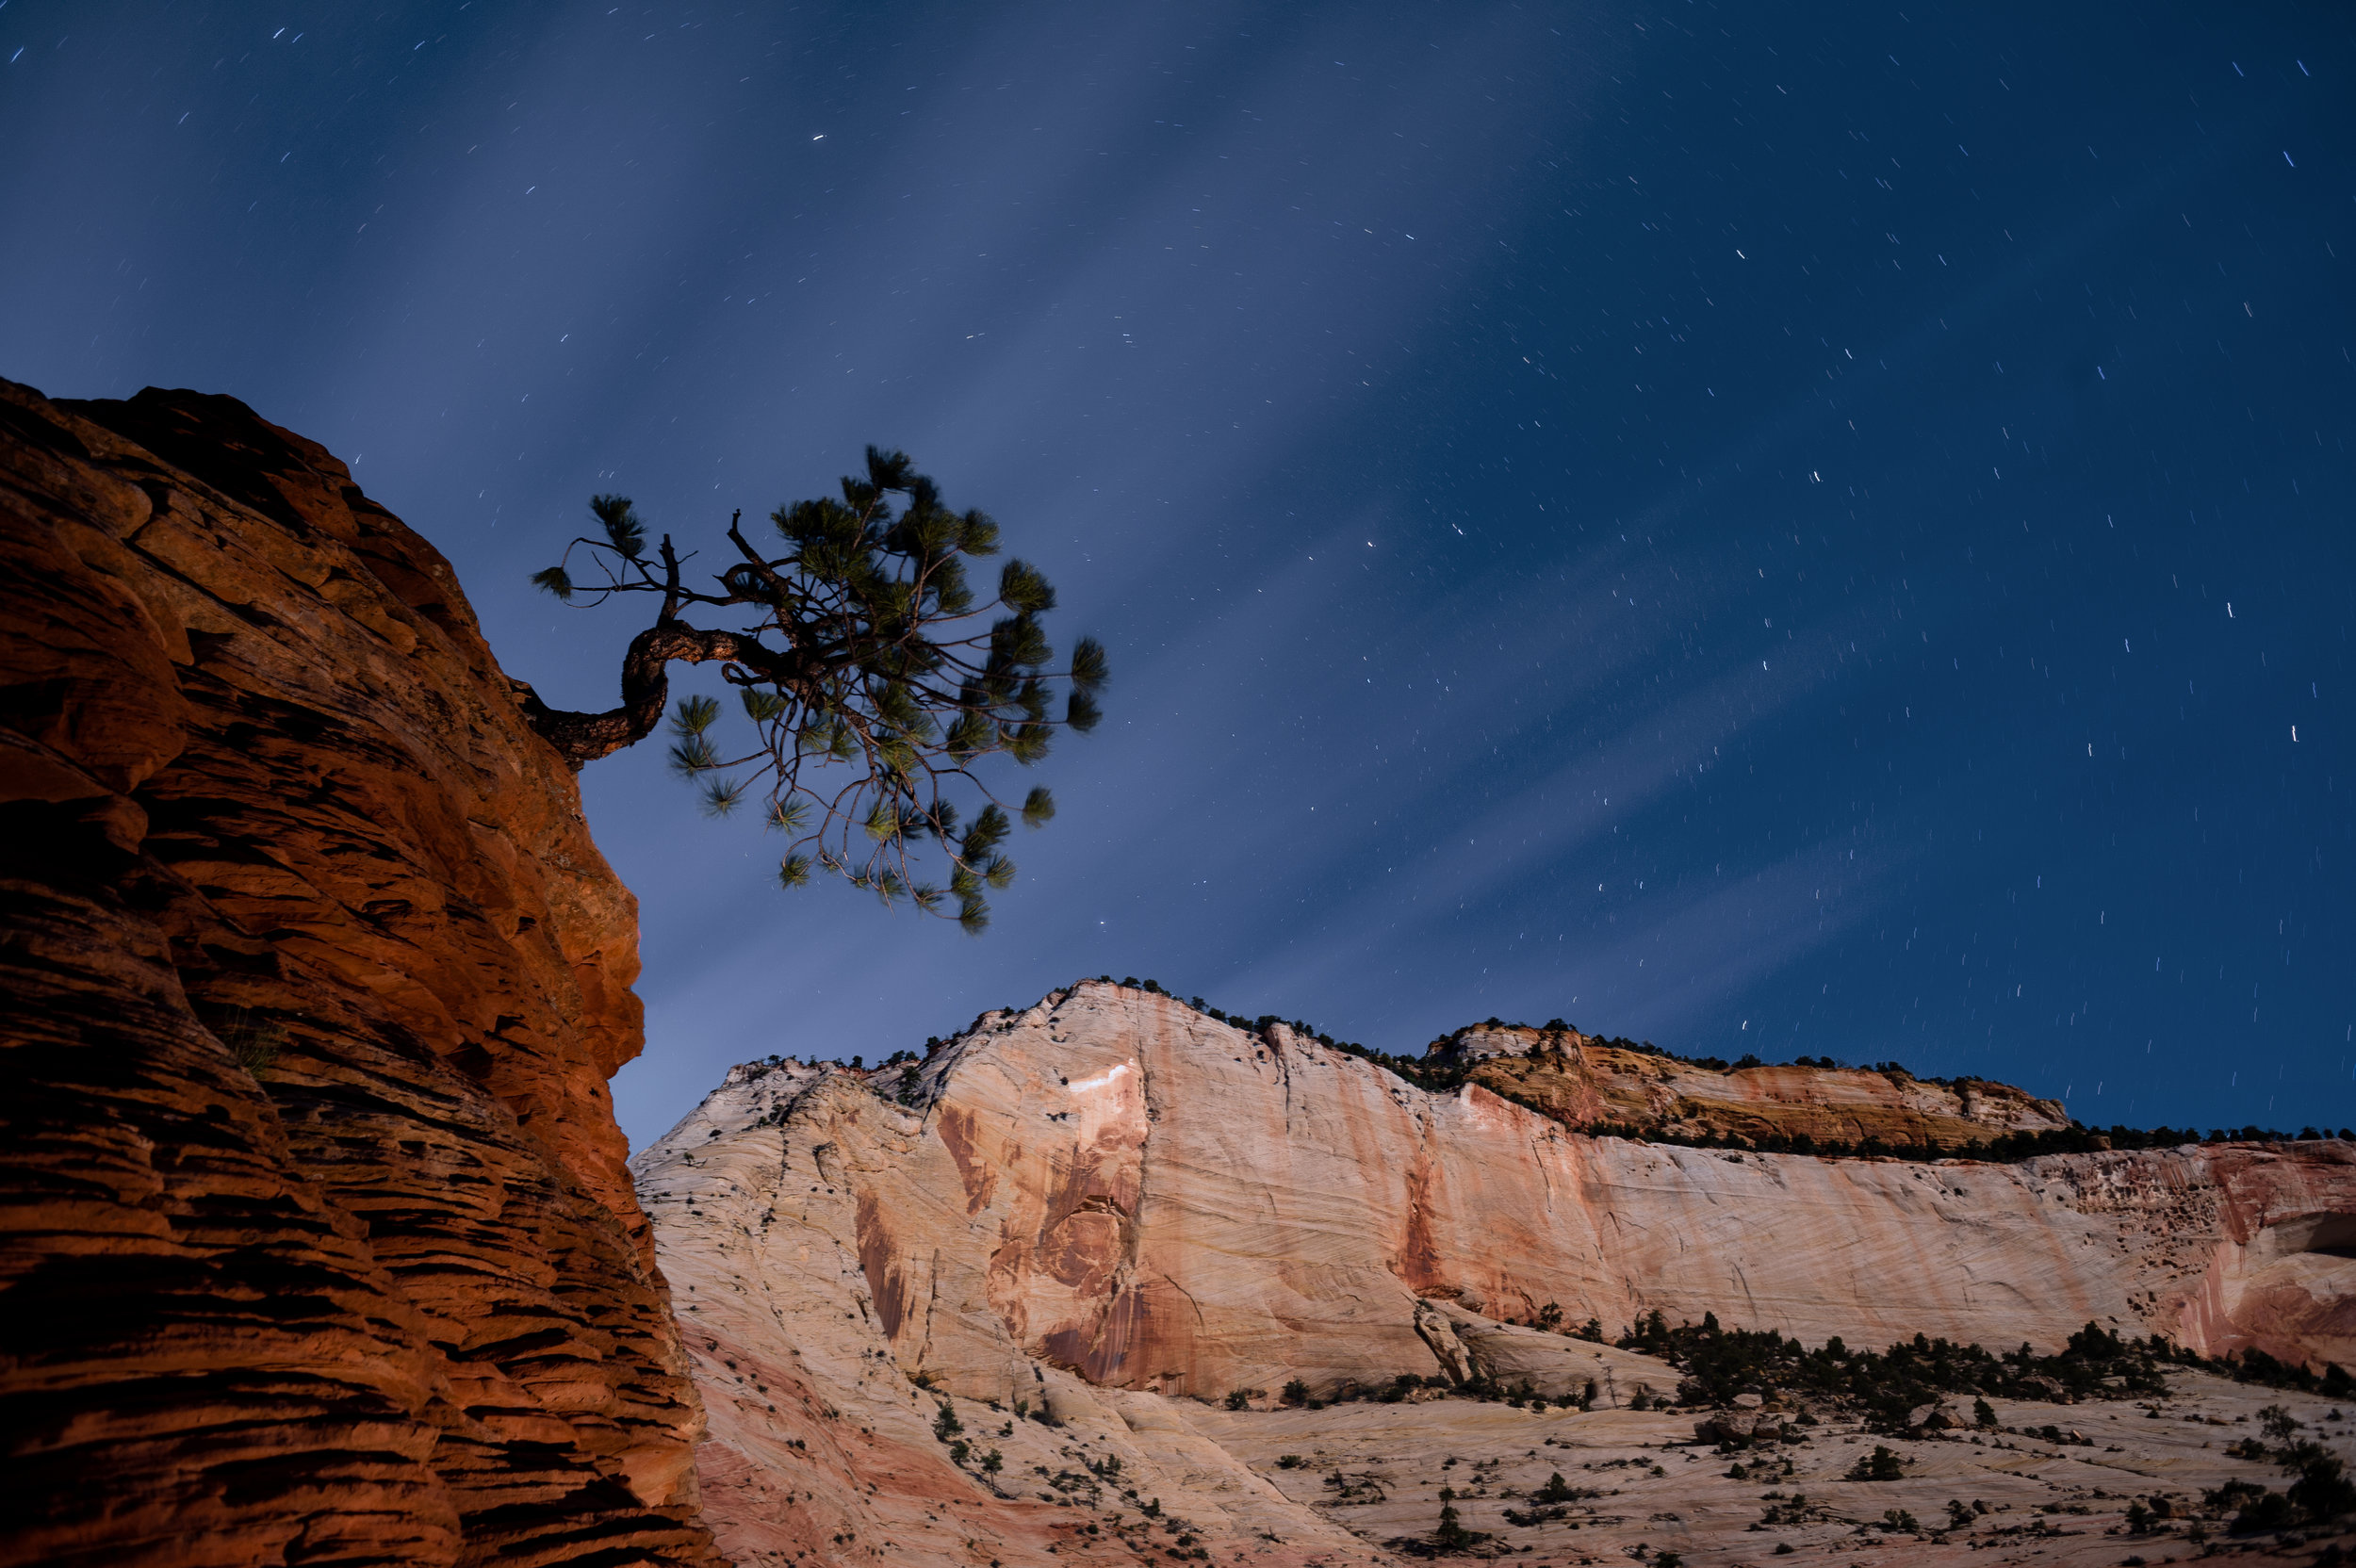 Moon as key light, flashlight as fill.  Nikon D4s with 24mm f/2.8 lens.   3 minutes, F/5.6, ISO 200.